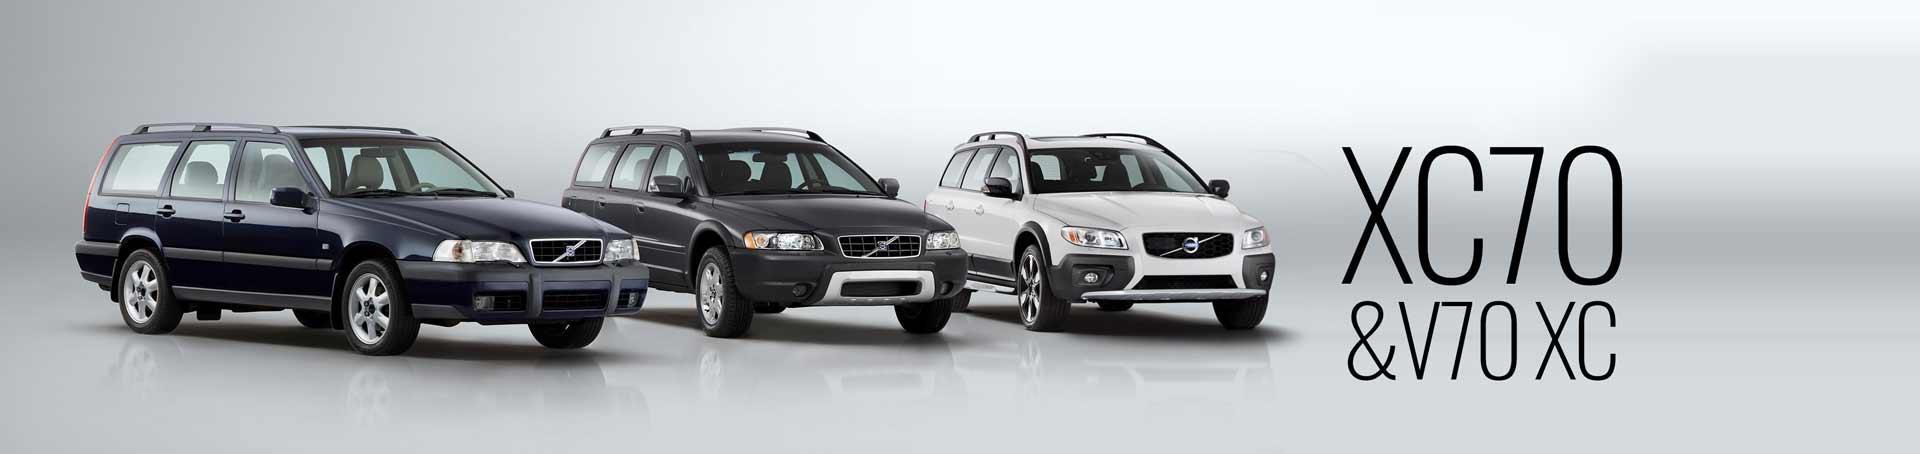 The Volvo XC70 & V70 XC - all three generations